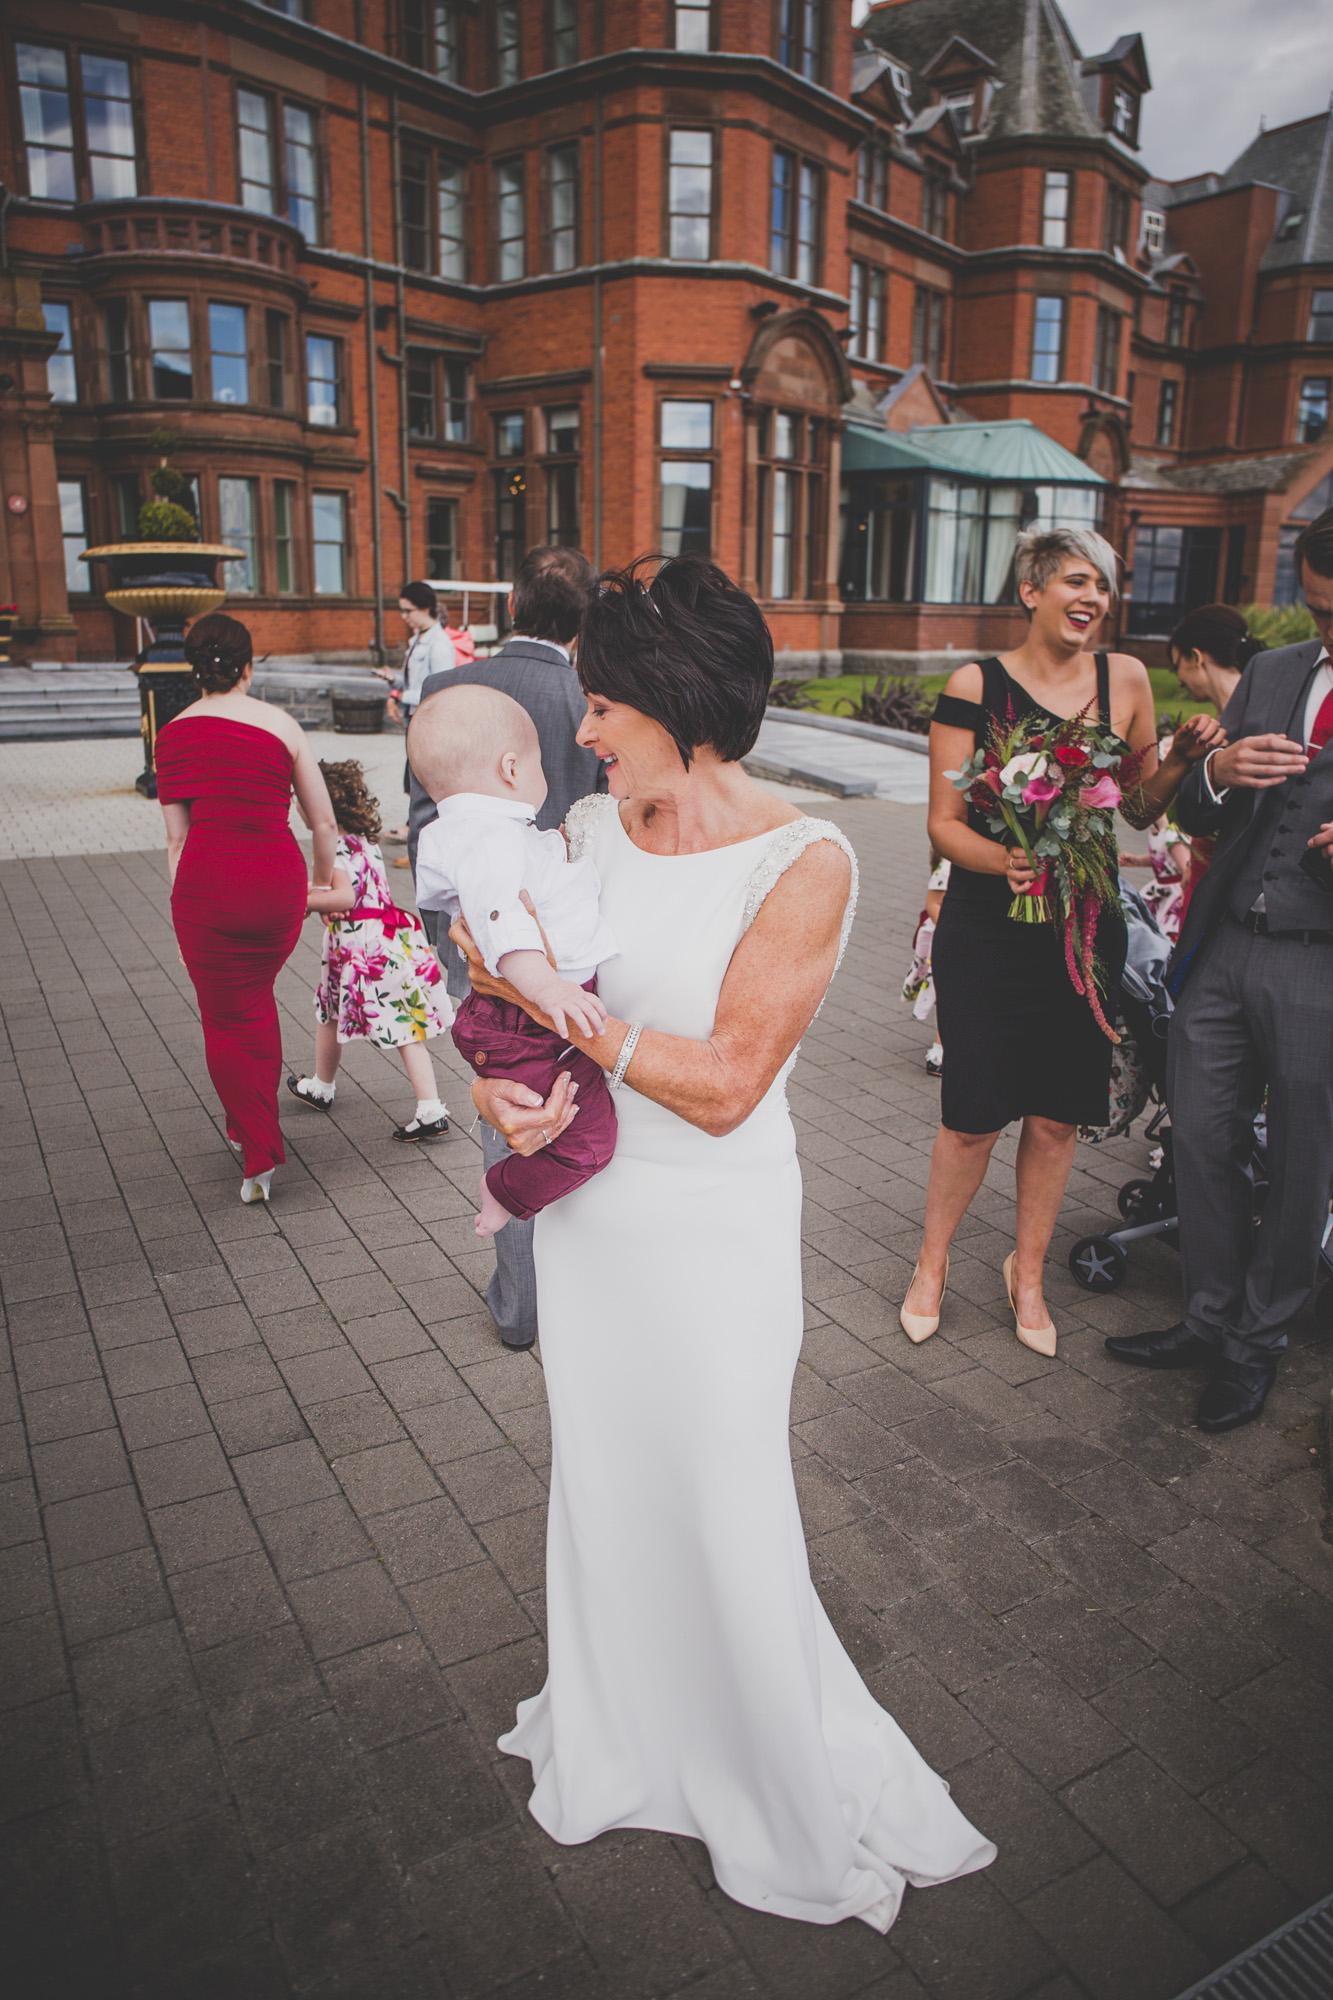 Slieve Donard Resort & Spa Wedding Photography County Down Andrew McKenna